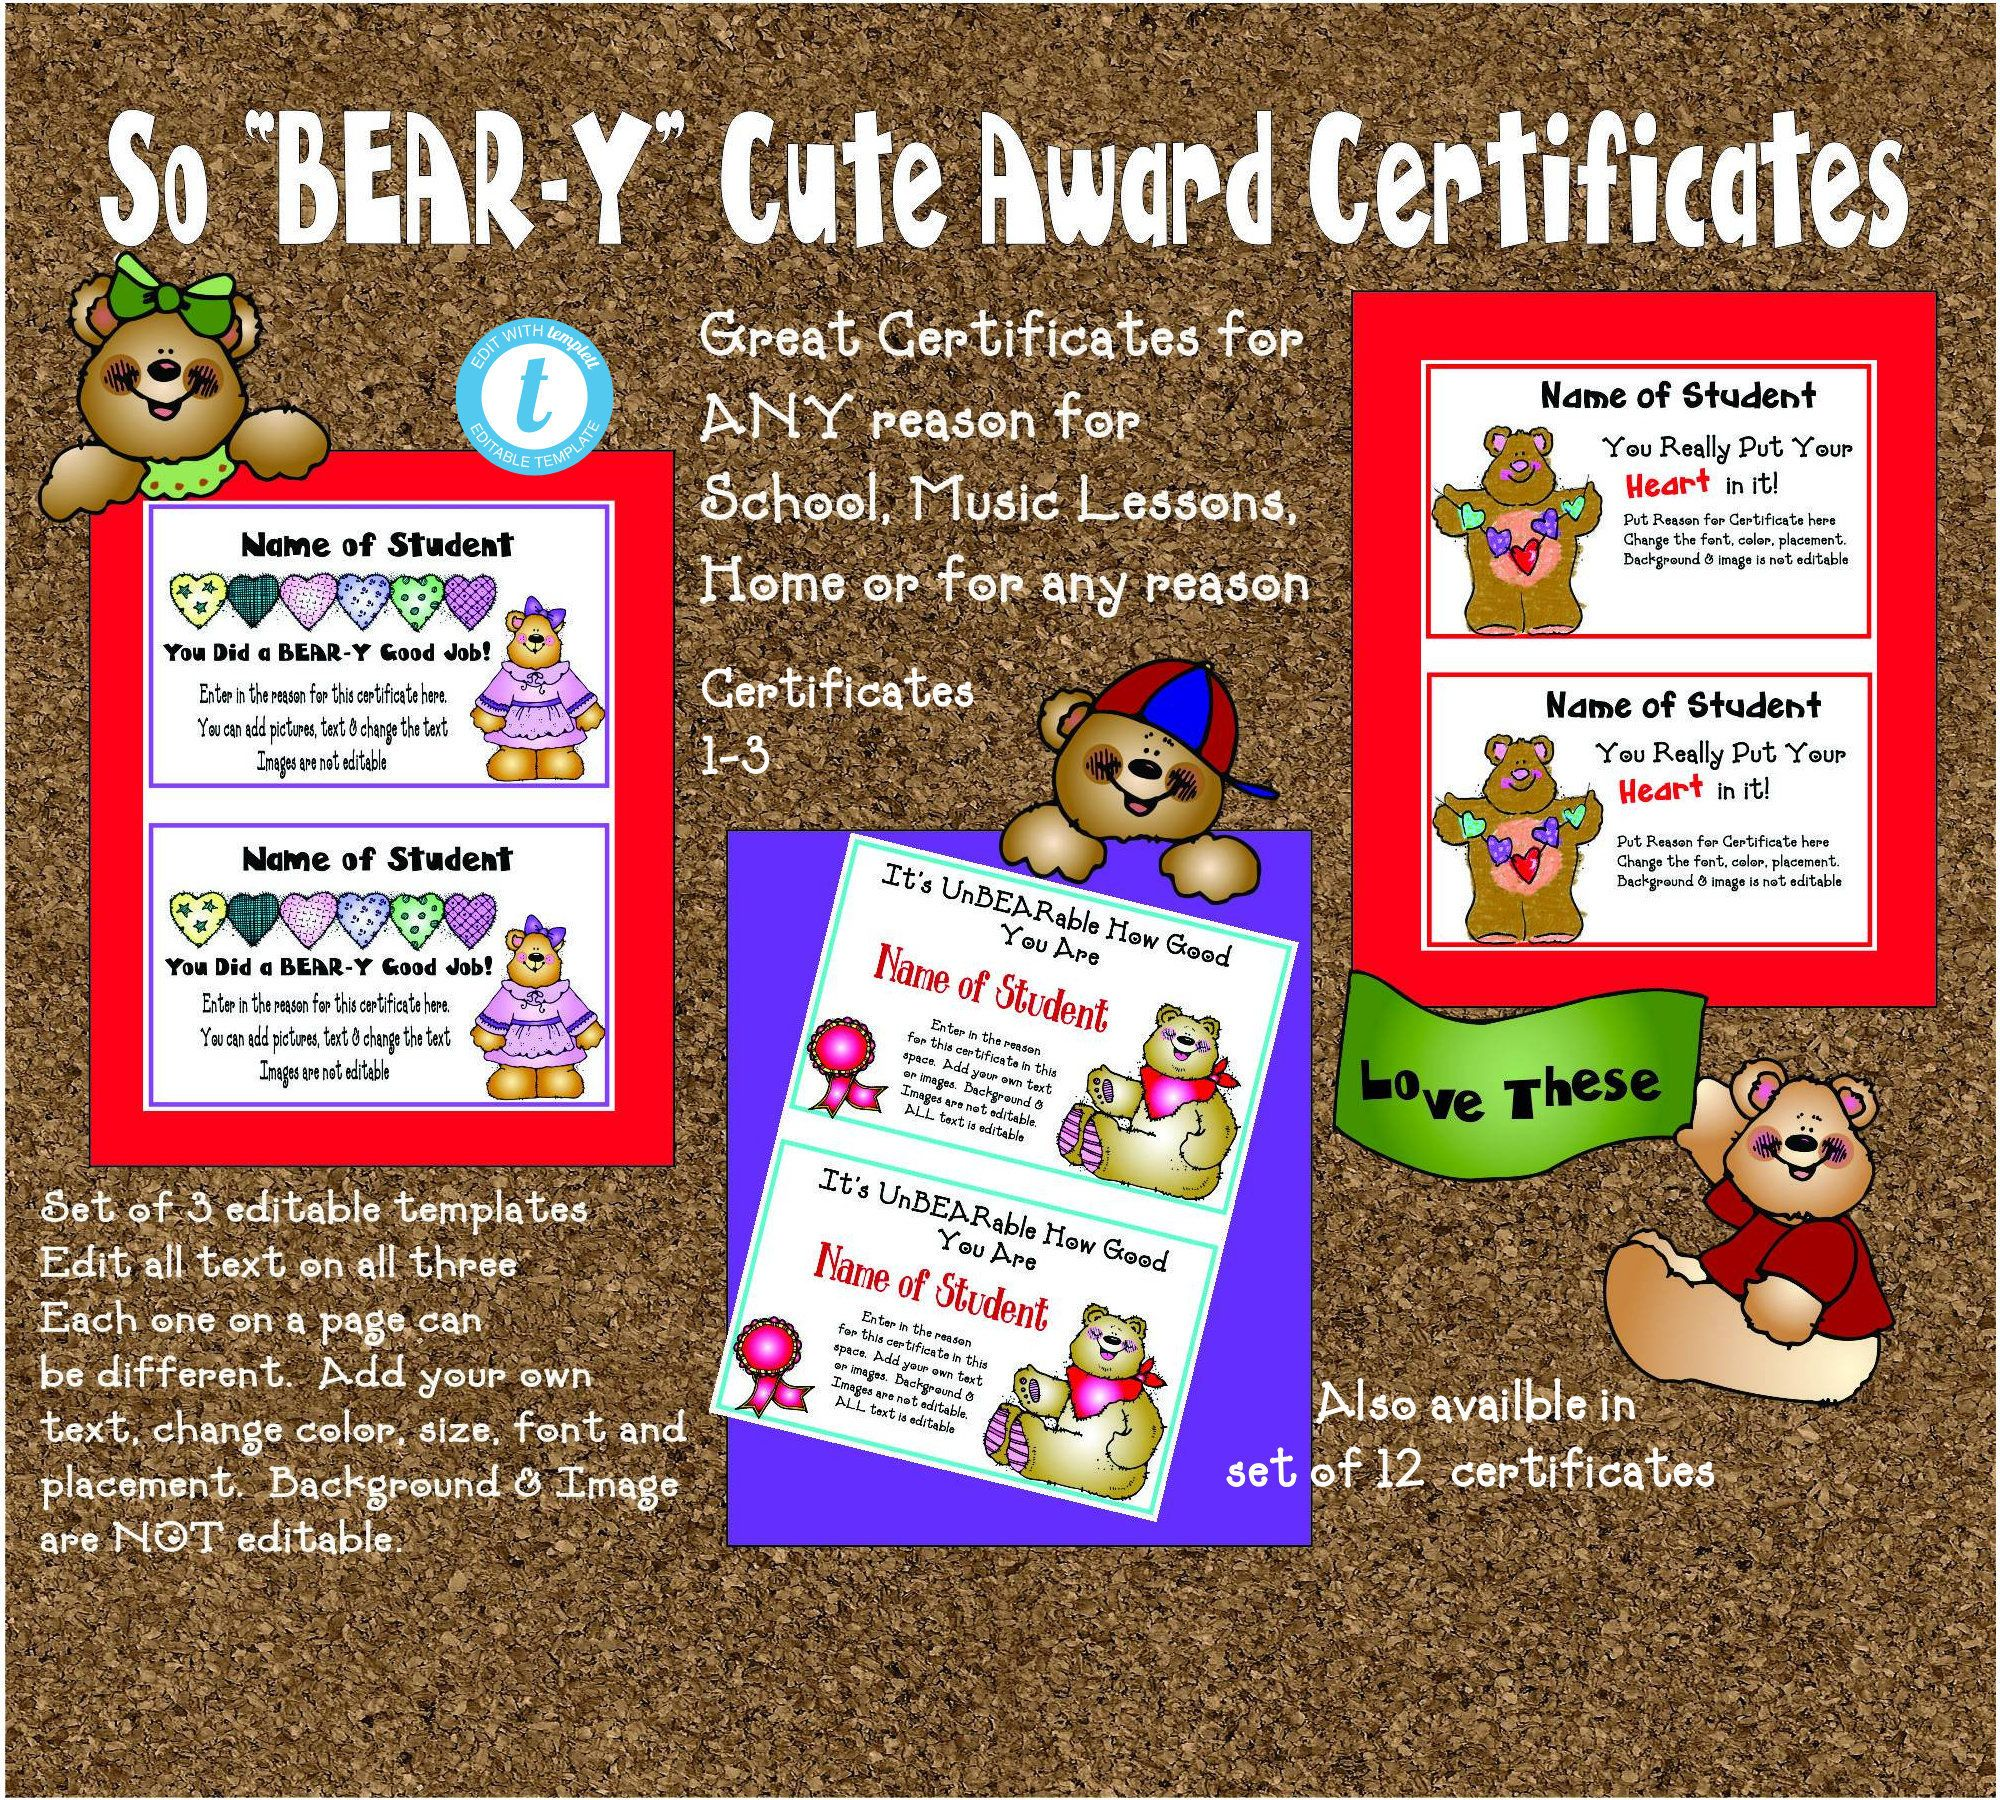 3 Cute Award Certificates-2 to a page-All text editable - School-Music-Home-Family-Teachers-Preschool-nursery-beary